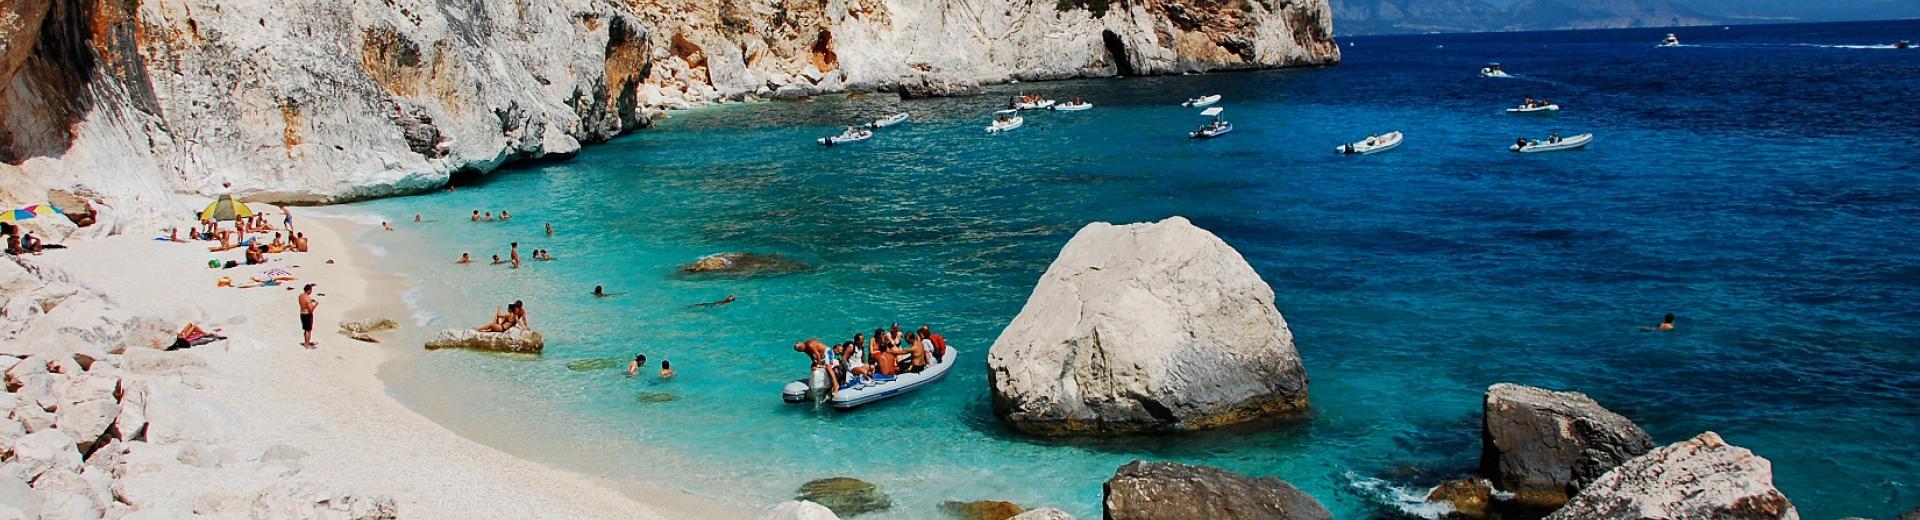 Beautiful rocky cove in Sardinia.